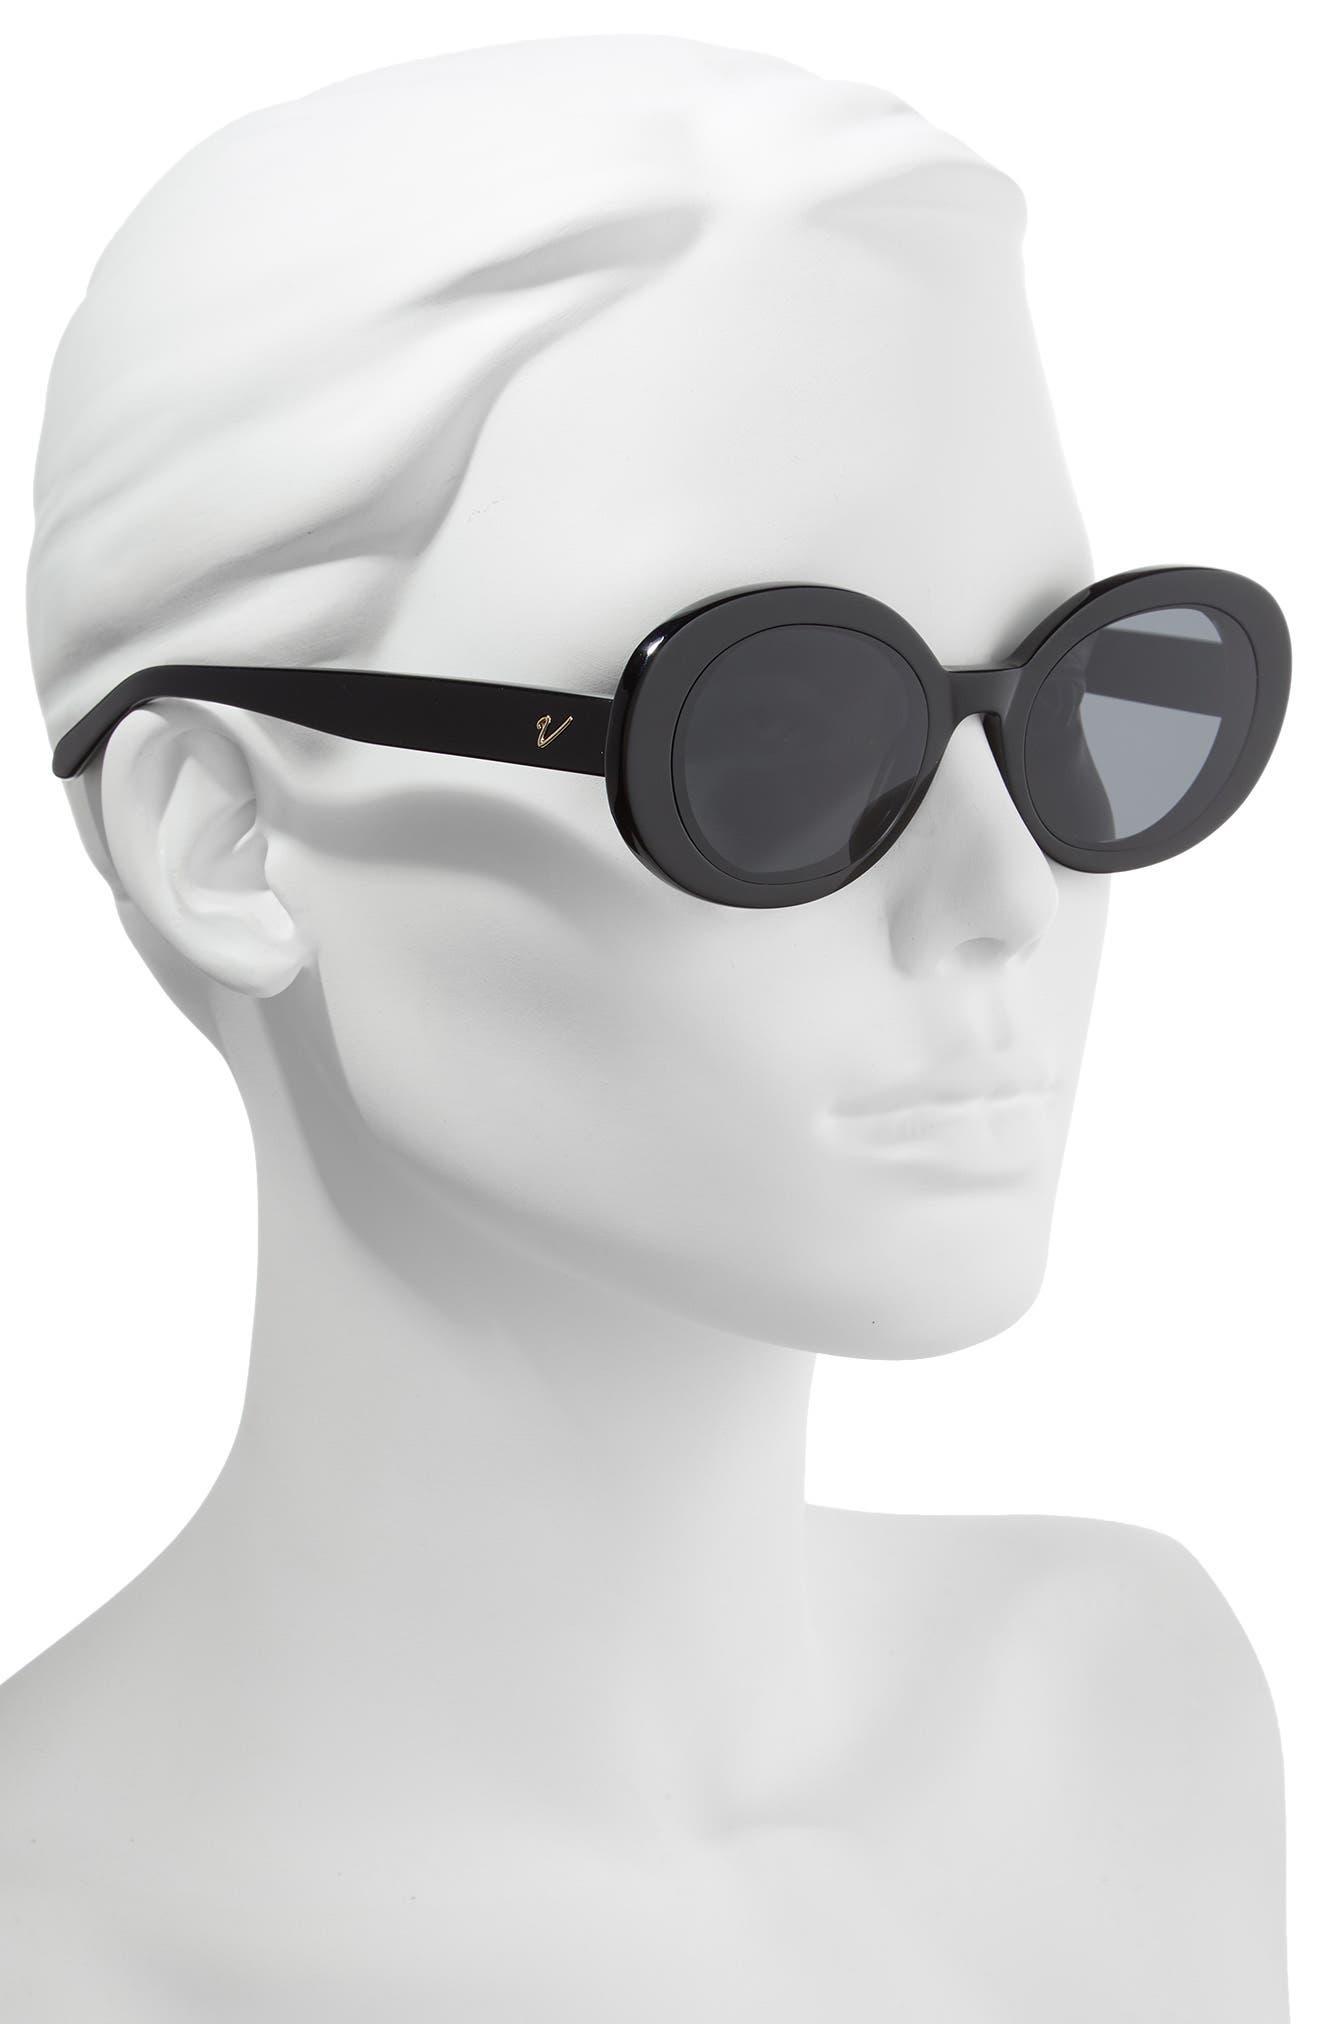 Selena 52mm Oval Sunglasses,                             Alternate thumbnail 2, color,                             BLACK/ SMOKE